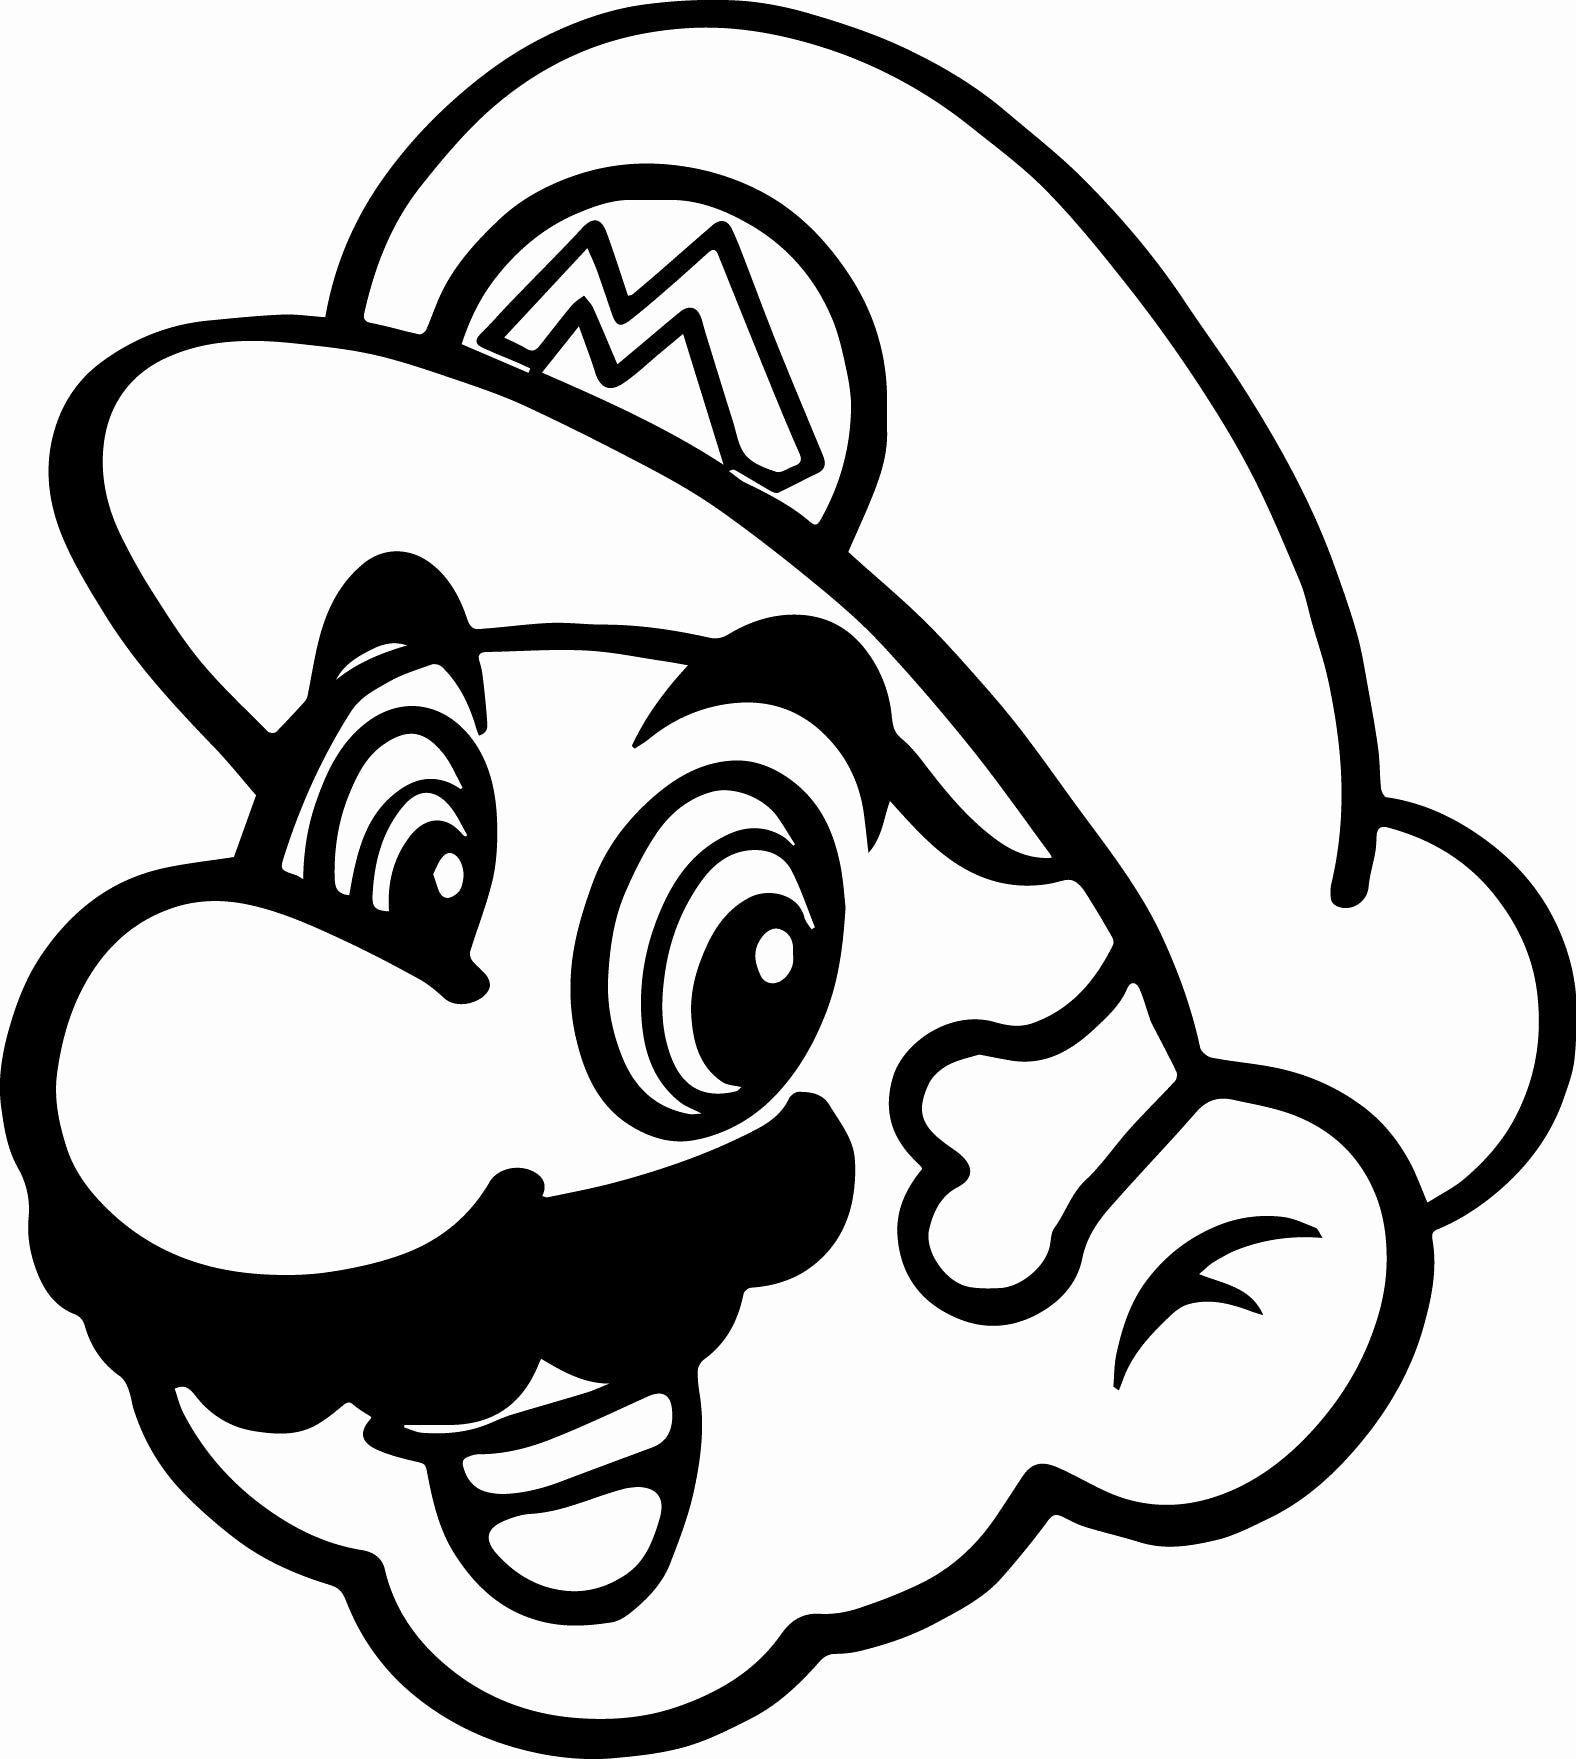 Color Coloring Drawings Fresh Rar Descargar Coloring Pages Blank Coloring Pages Color Halloweencoloringpages C Desenho Super Mario Ideias Para Pintura Desenho